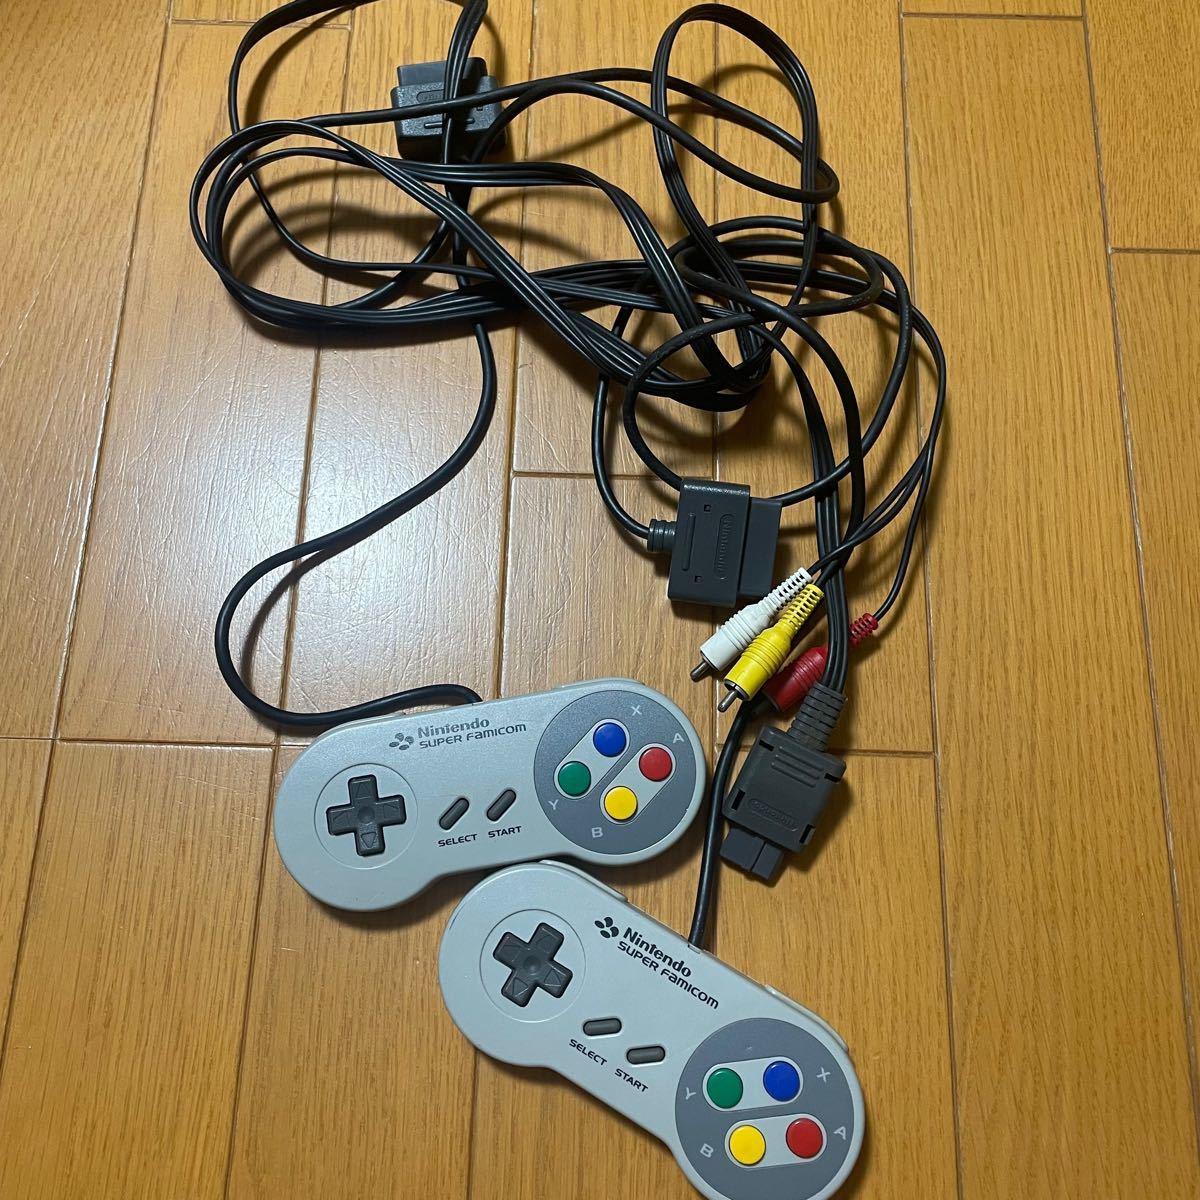 Nintendo SUPER Famicm/スーパーファミコン